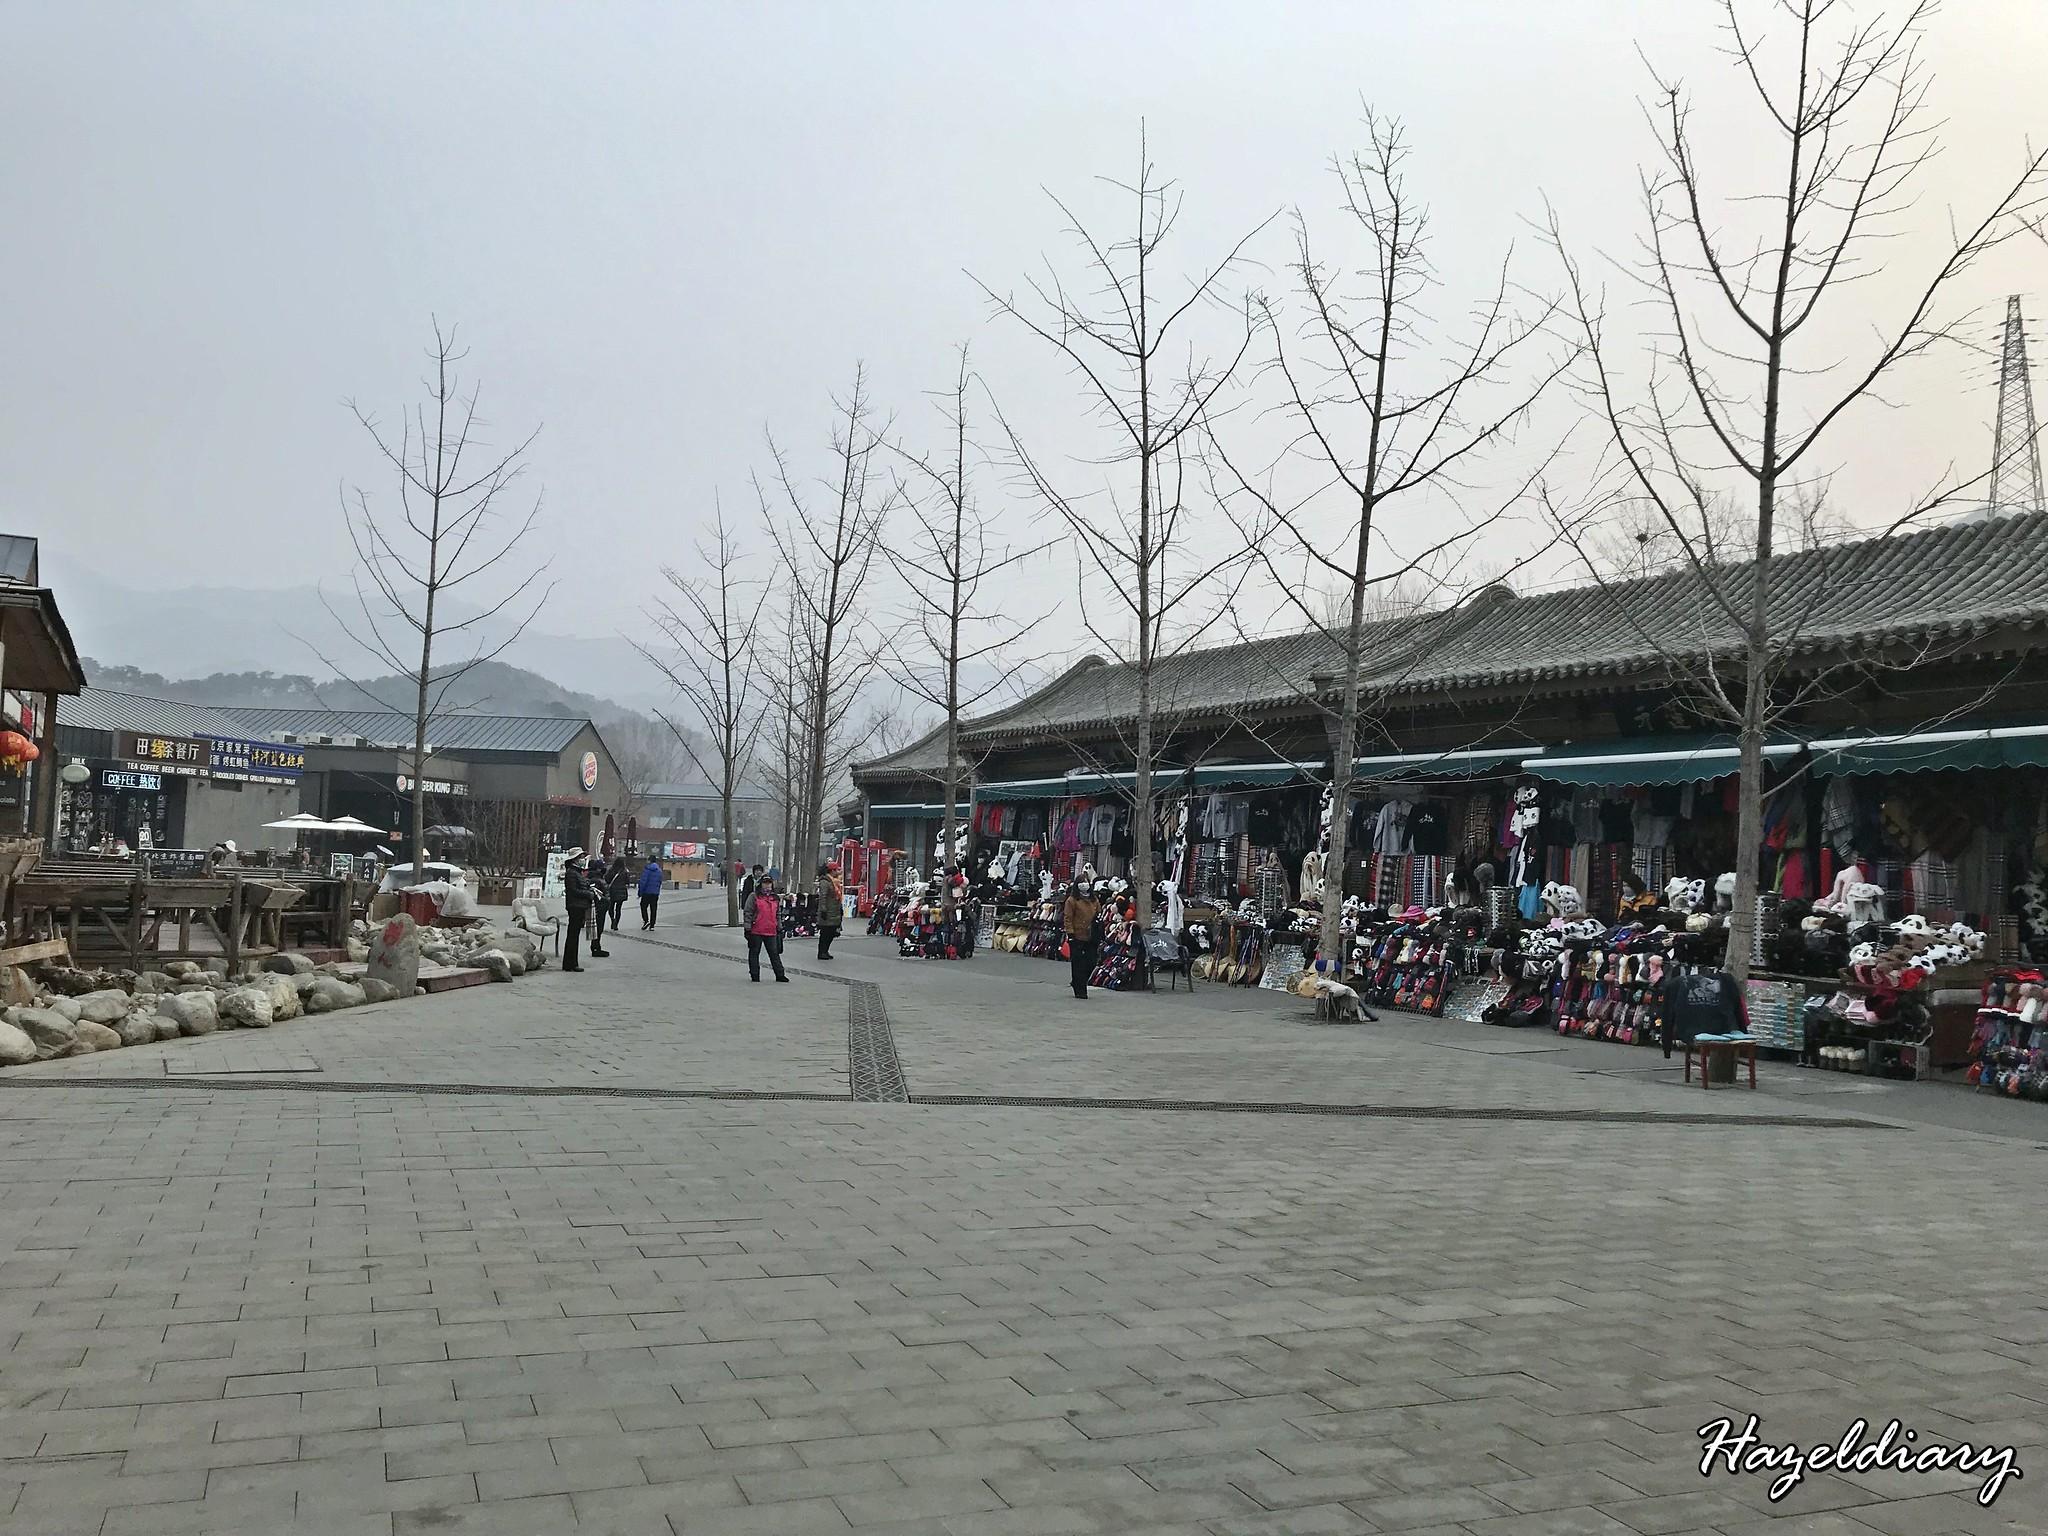 The Great Wall of China Mutianyu -foot mountain